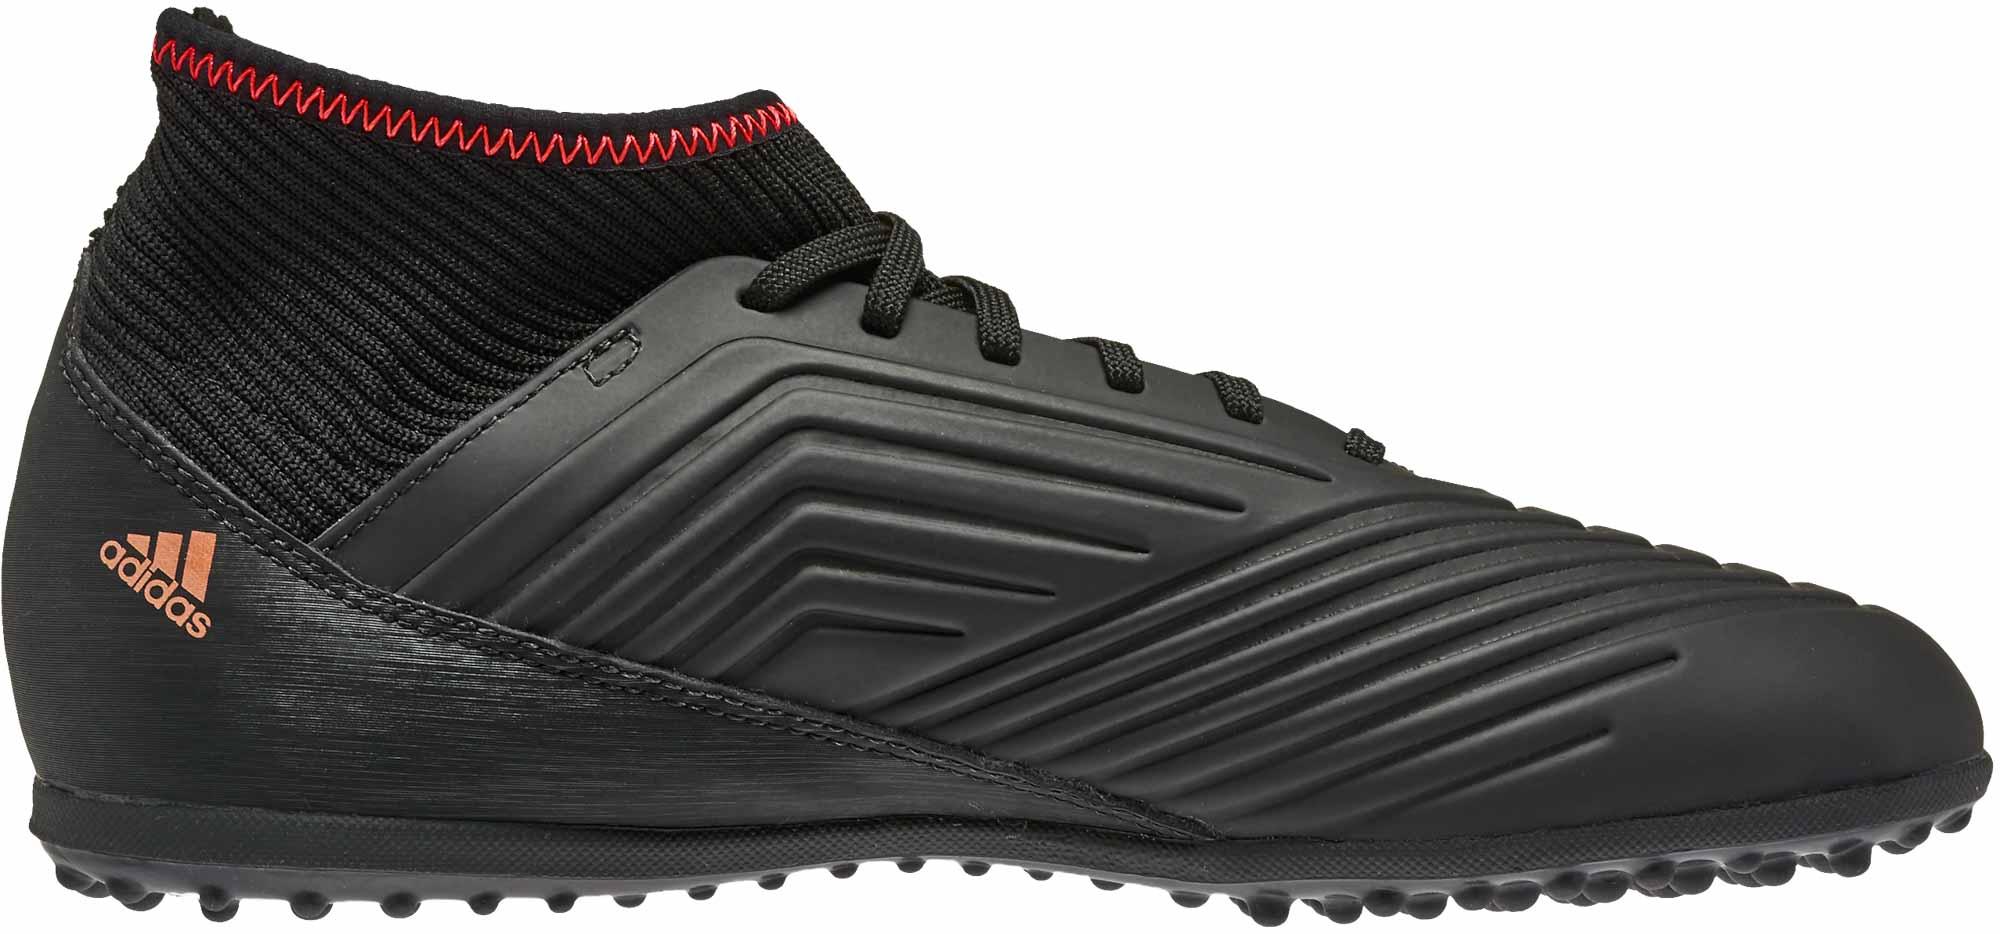 Predator Adidas indoor soccer shoes catalog photo